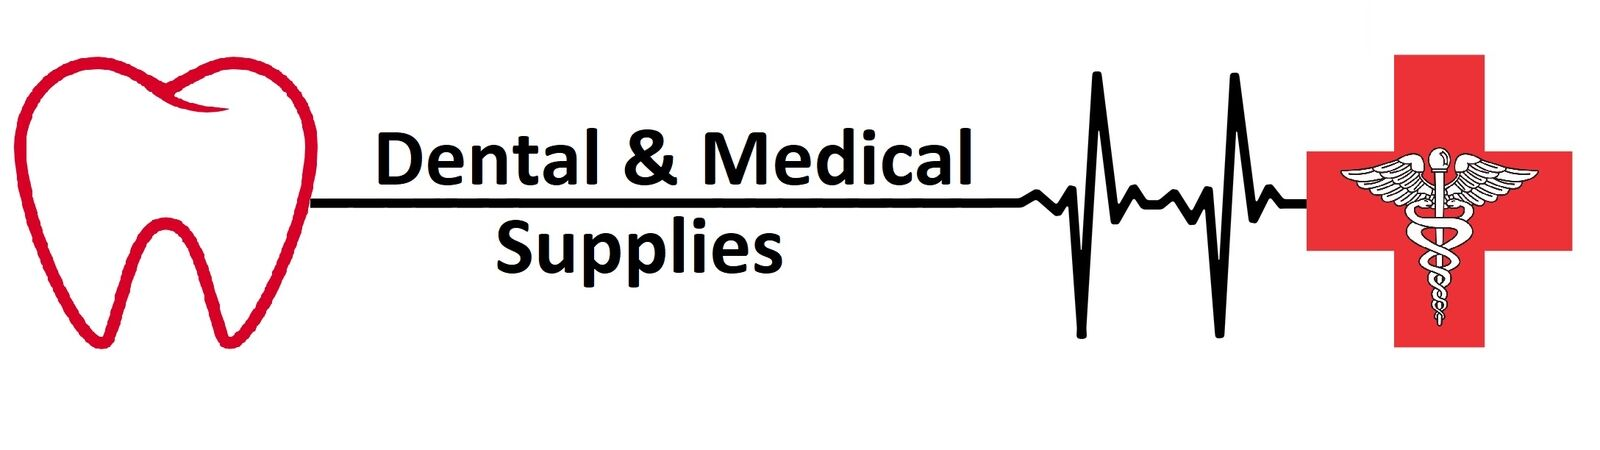 dentalandmedicalsupplies